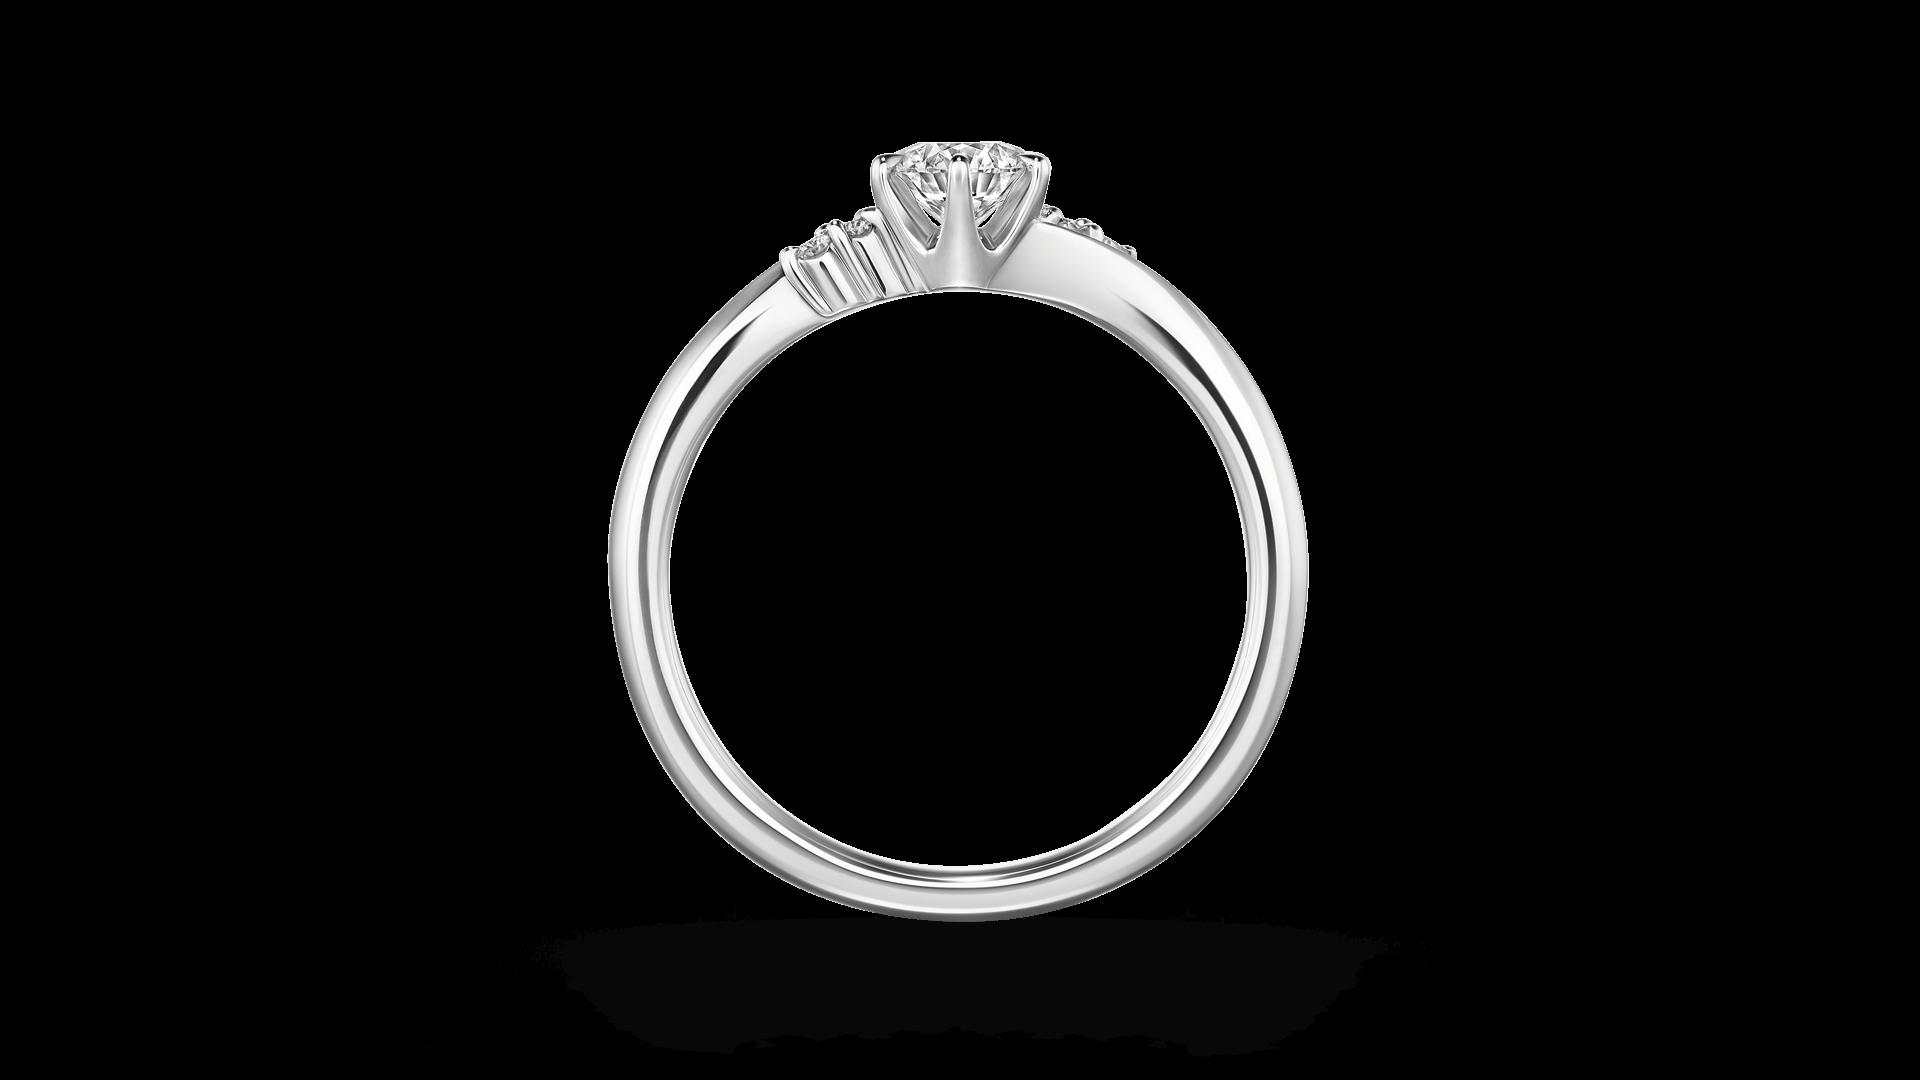 asterope アステローペ≪7月23日(木)発売≫ | 婚約指輪サムネイル 2